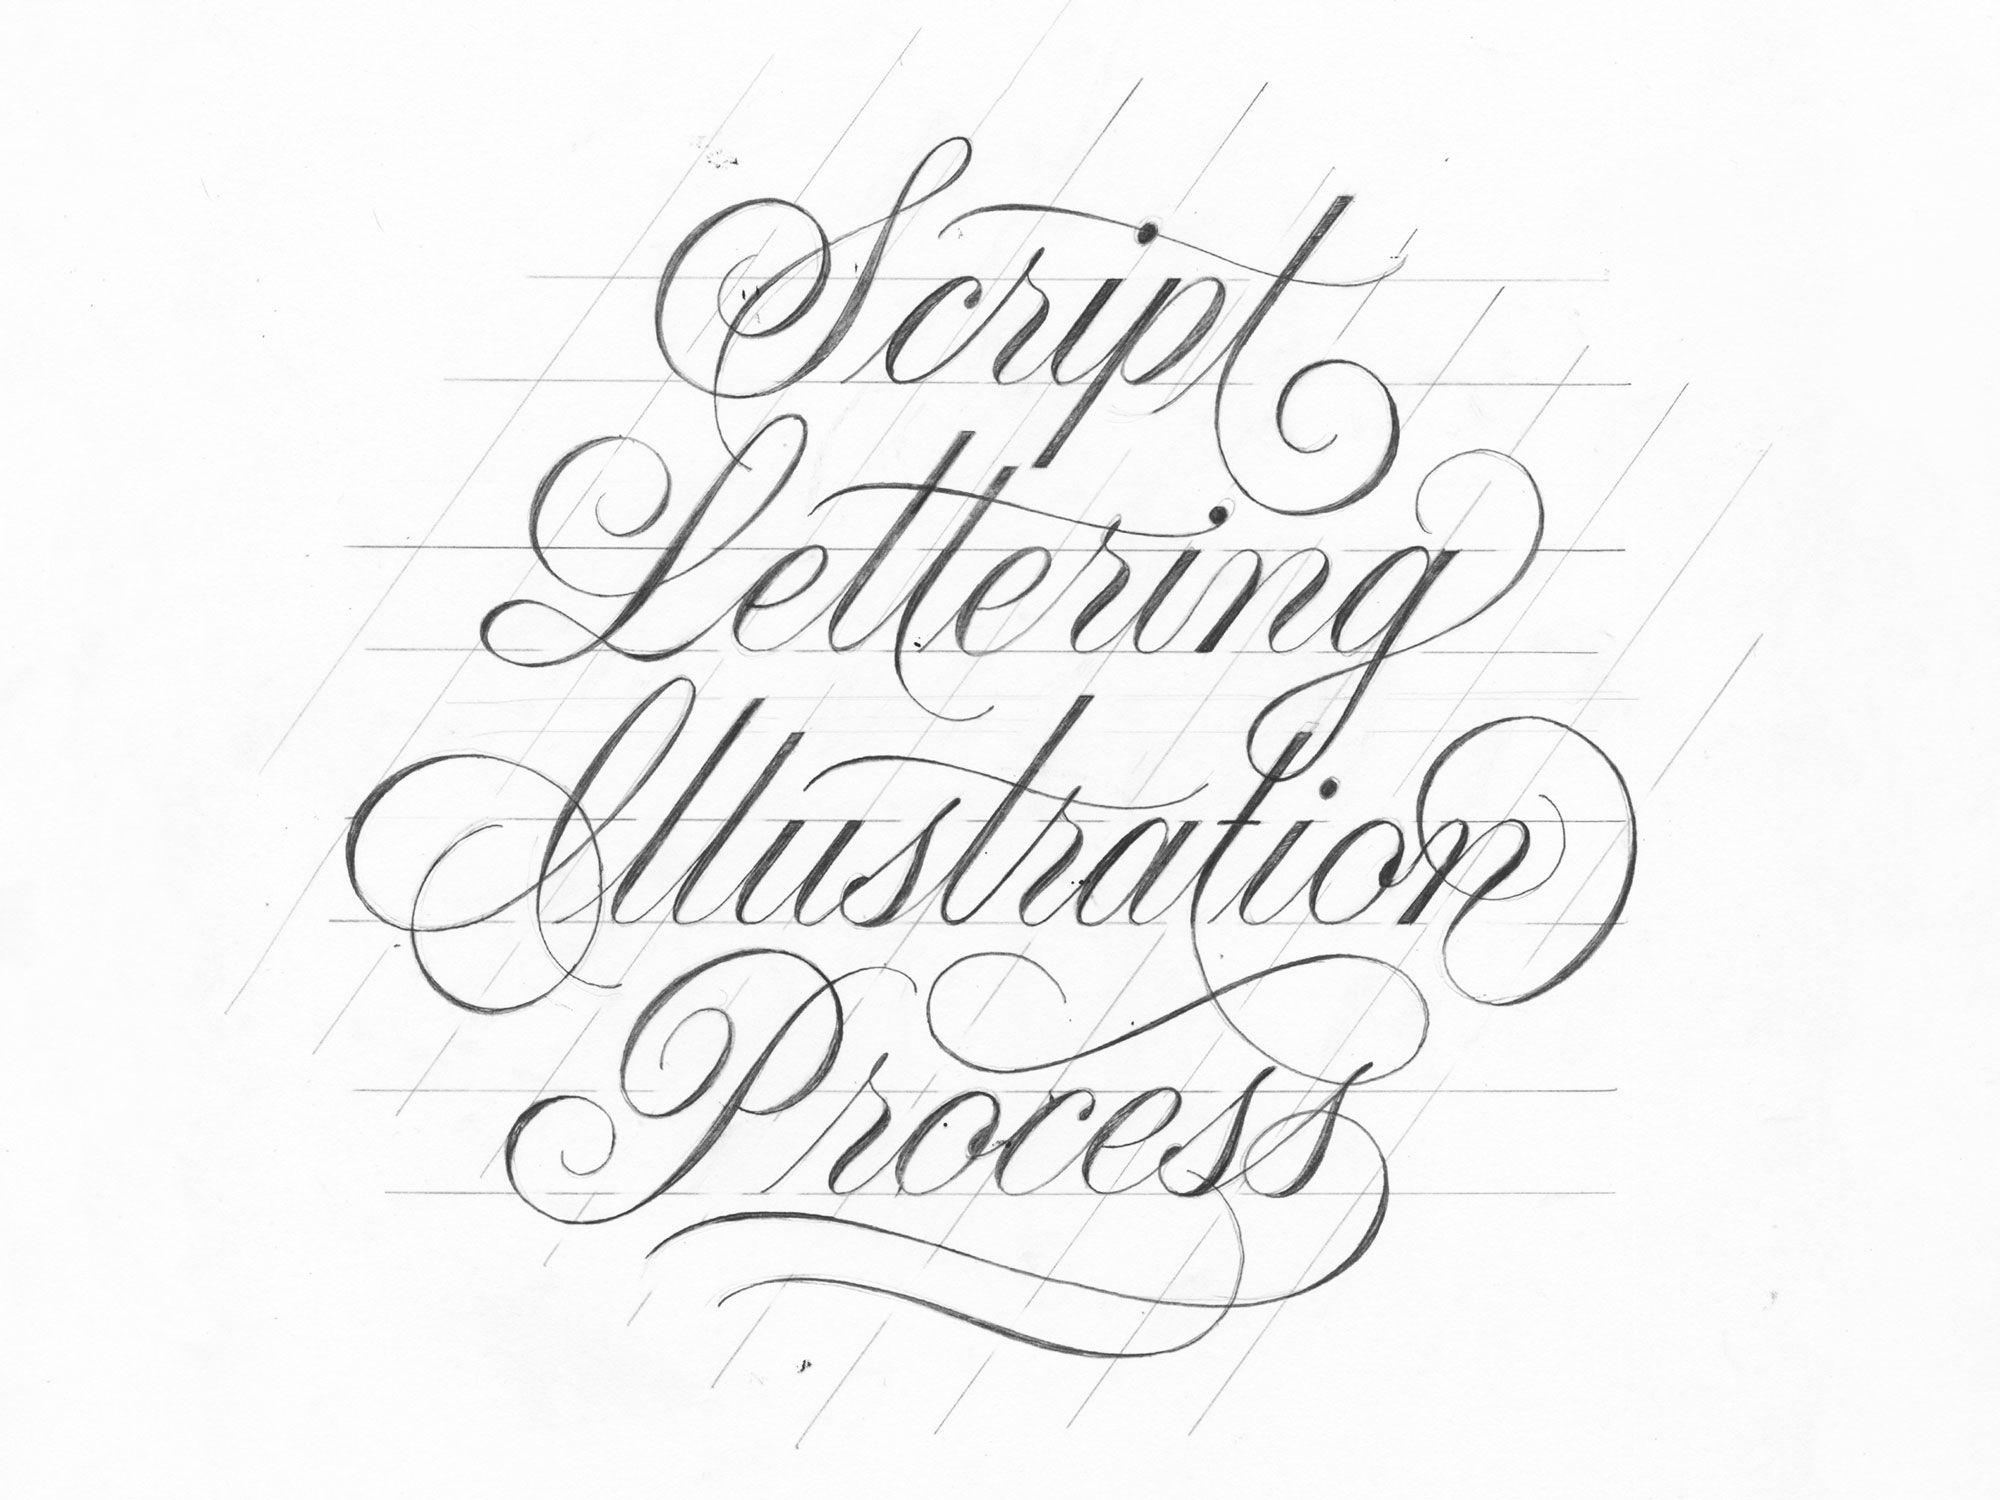 Script Lettering Illustration Process